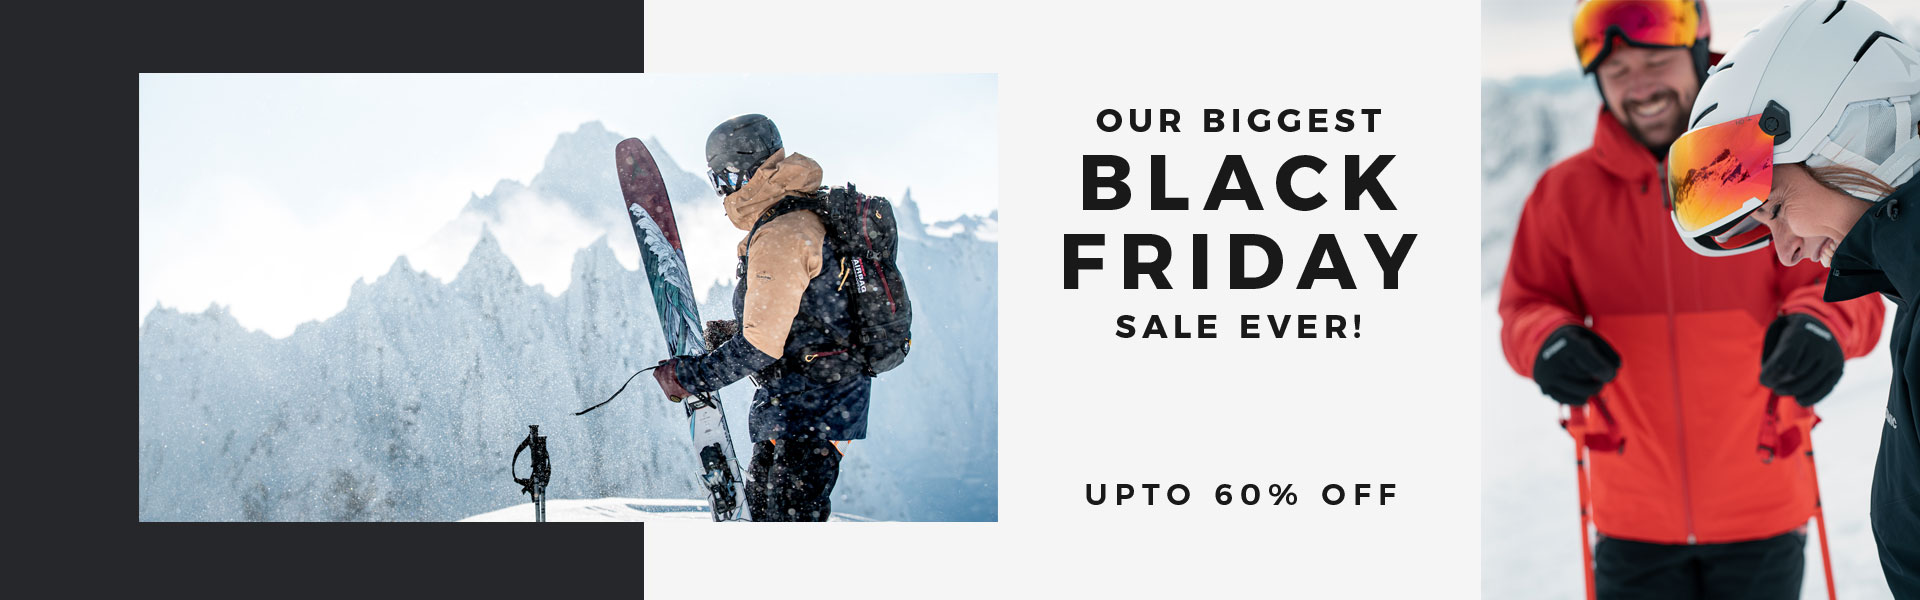 Black Friday Ski & Snowboard Deals